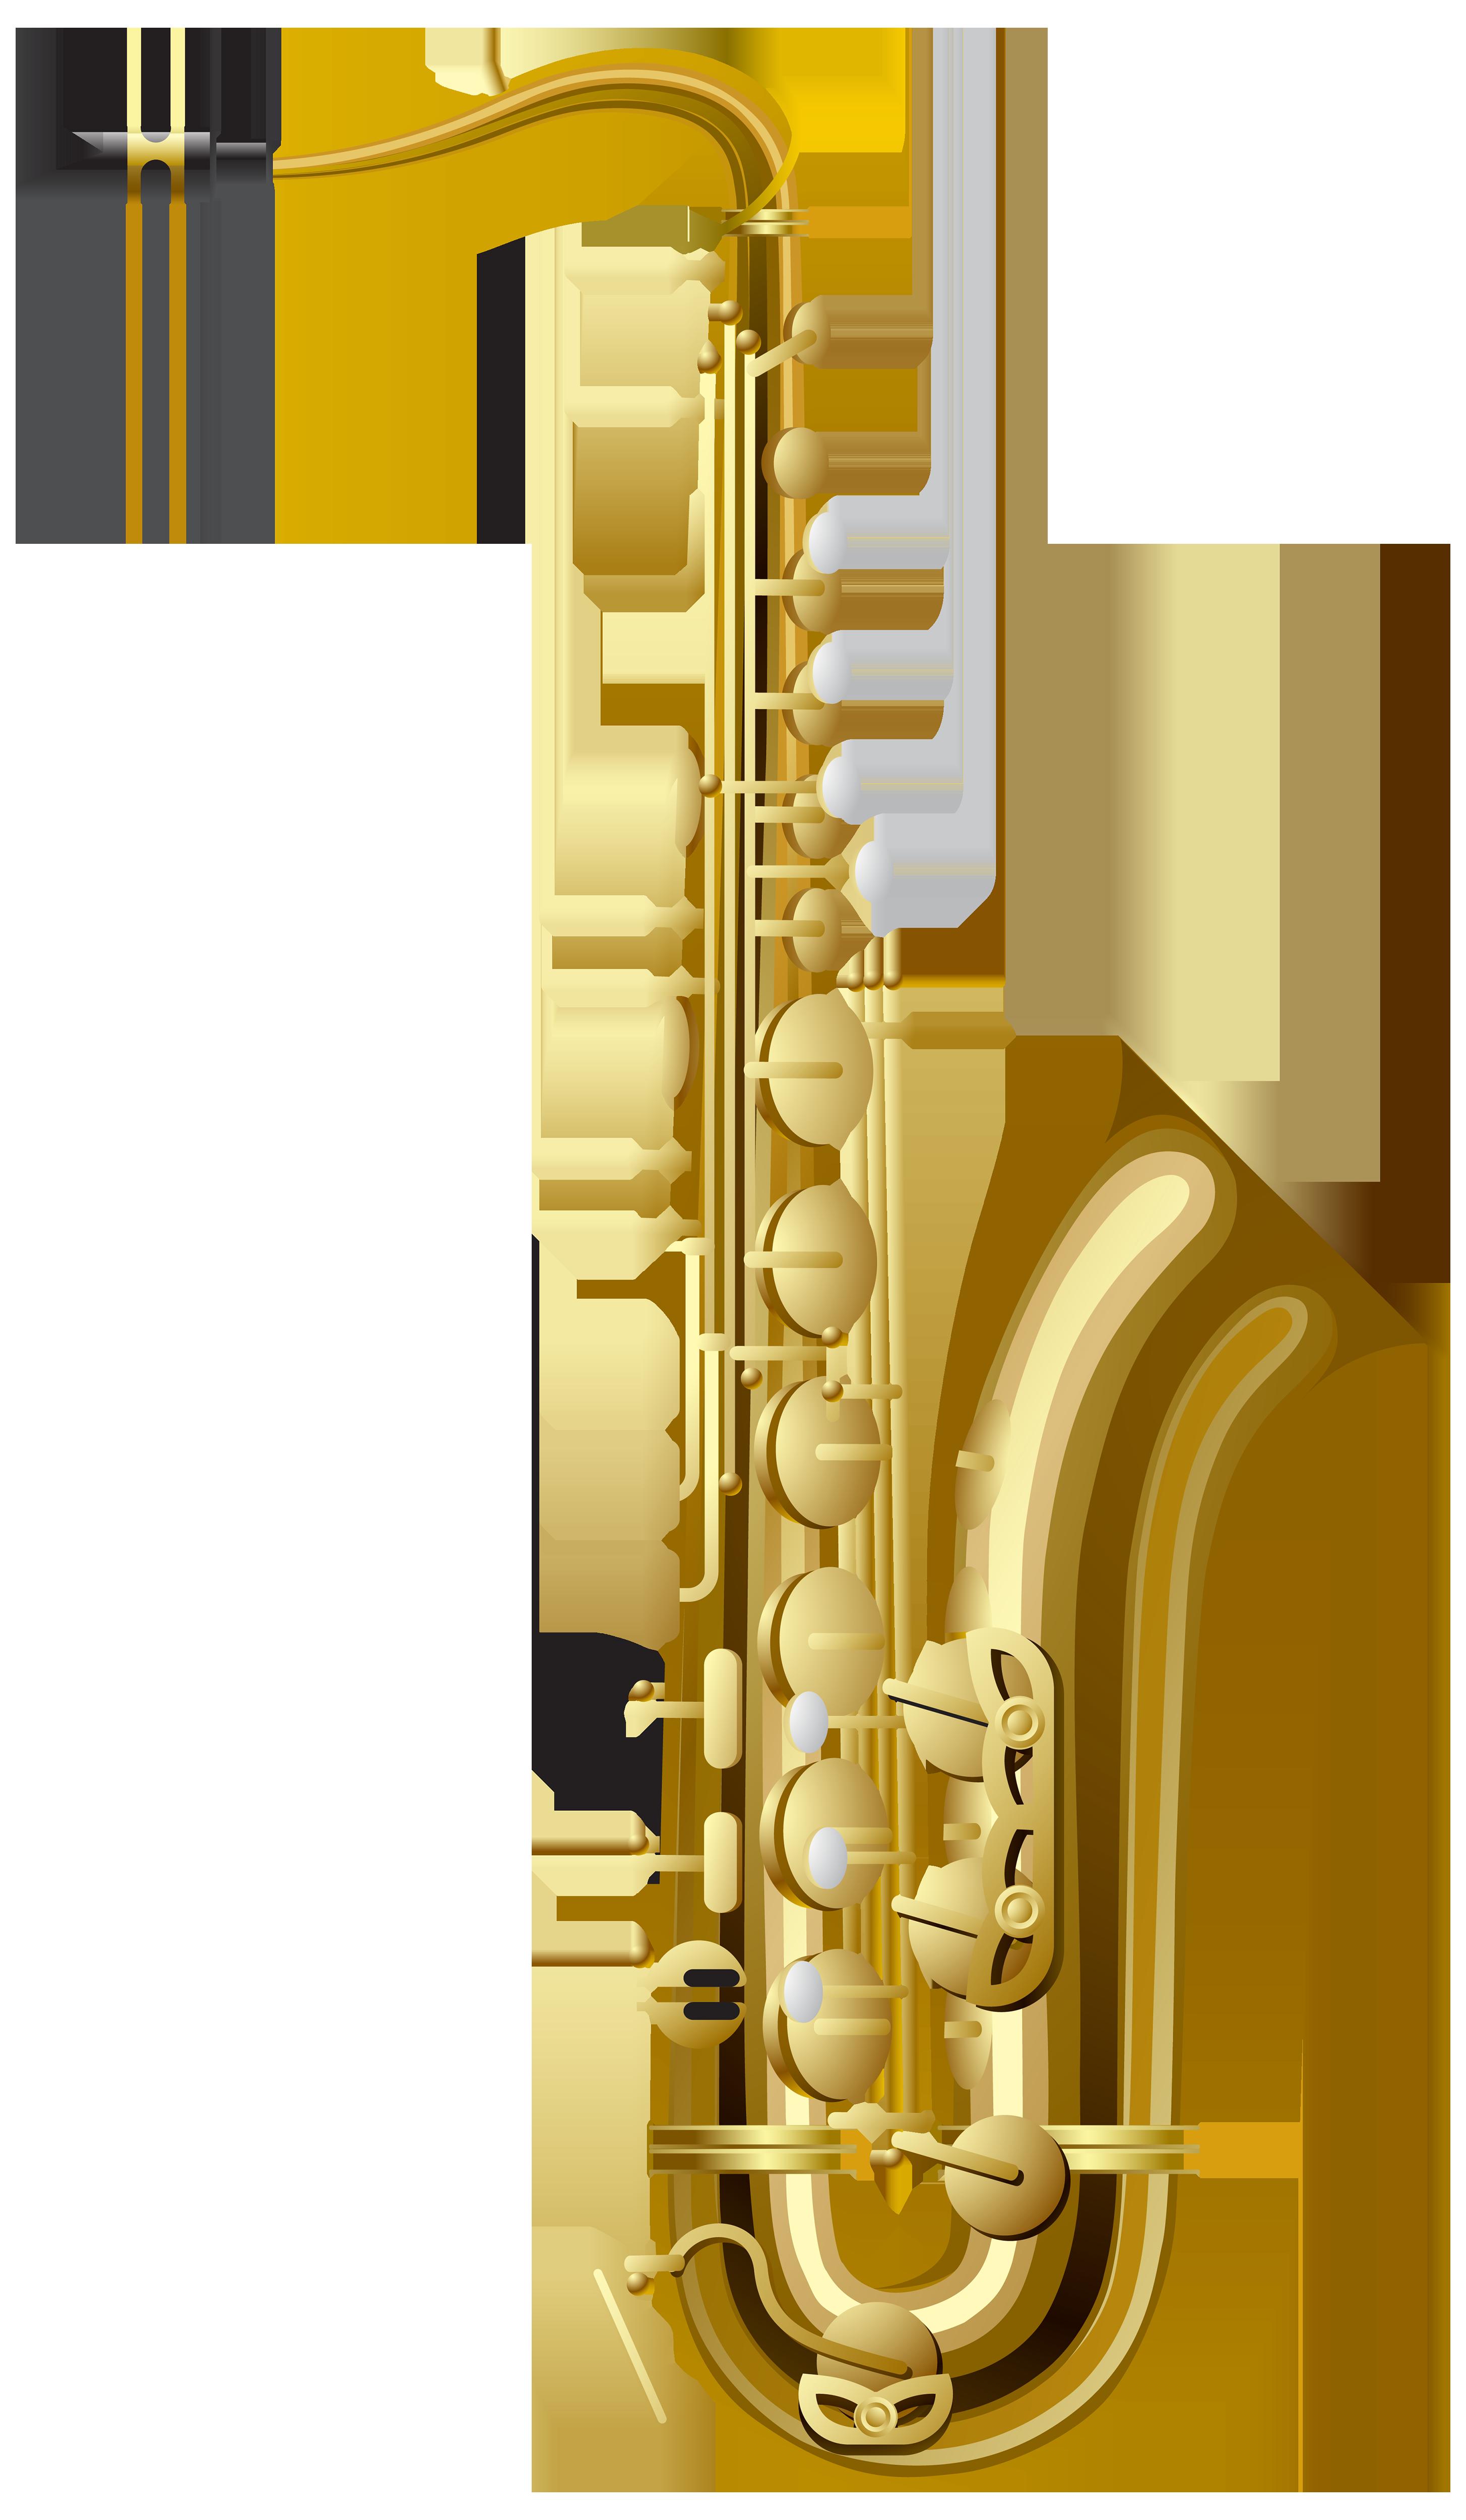 graphic transparent Png best web. Gold clipart saxophone